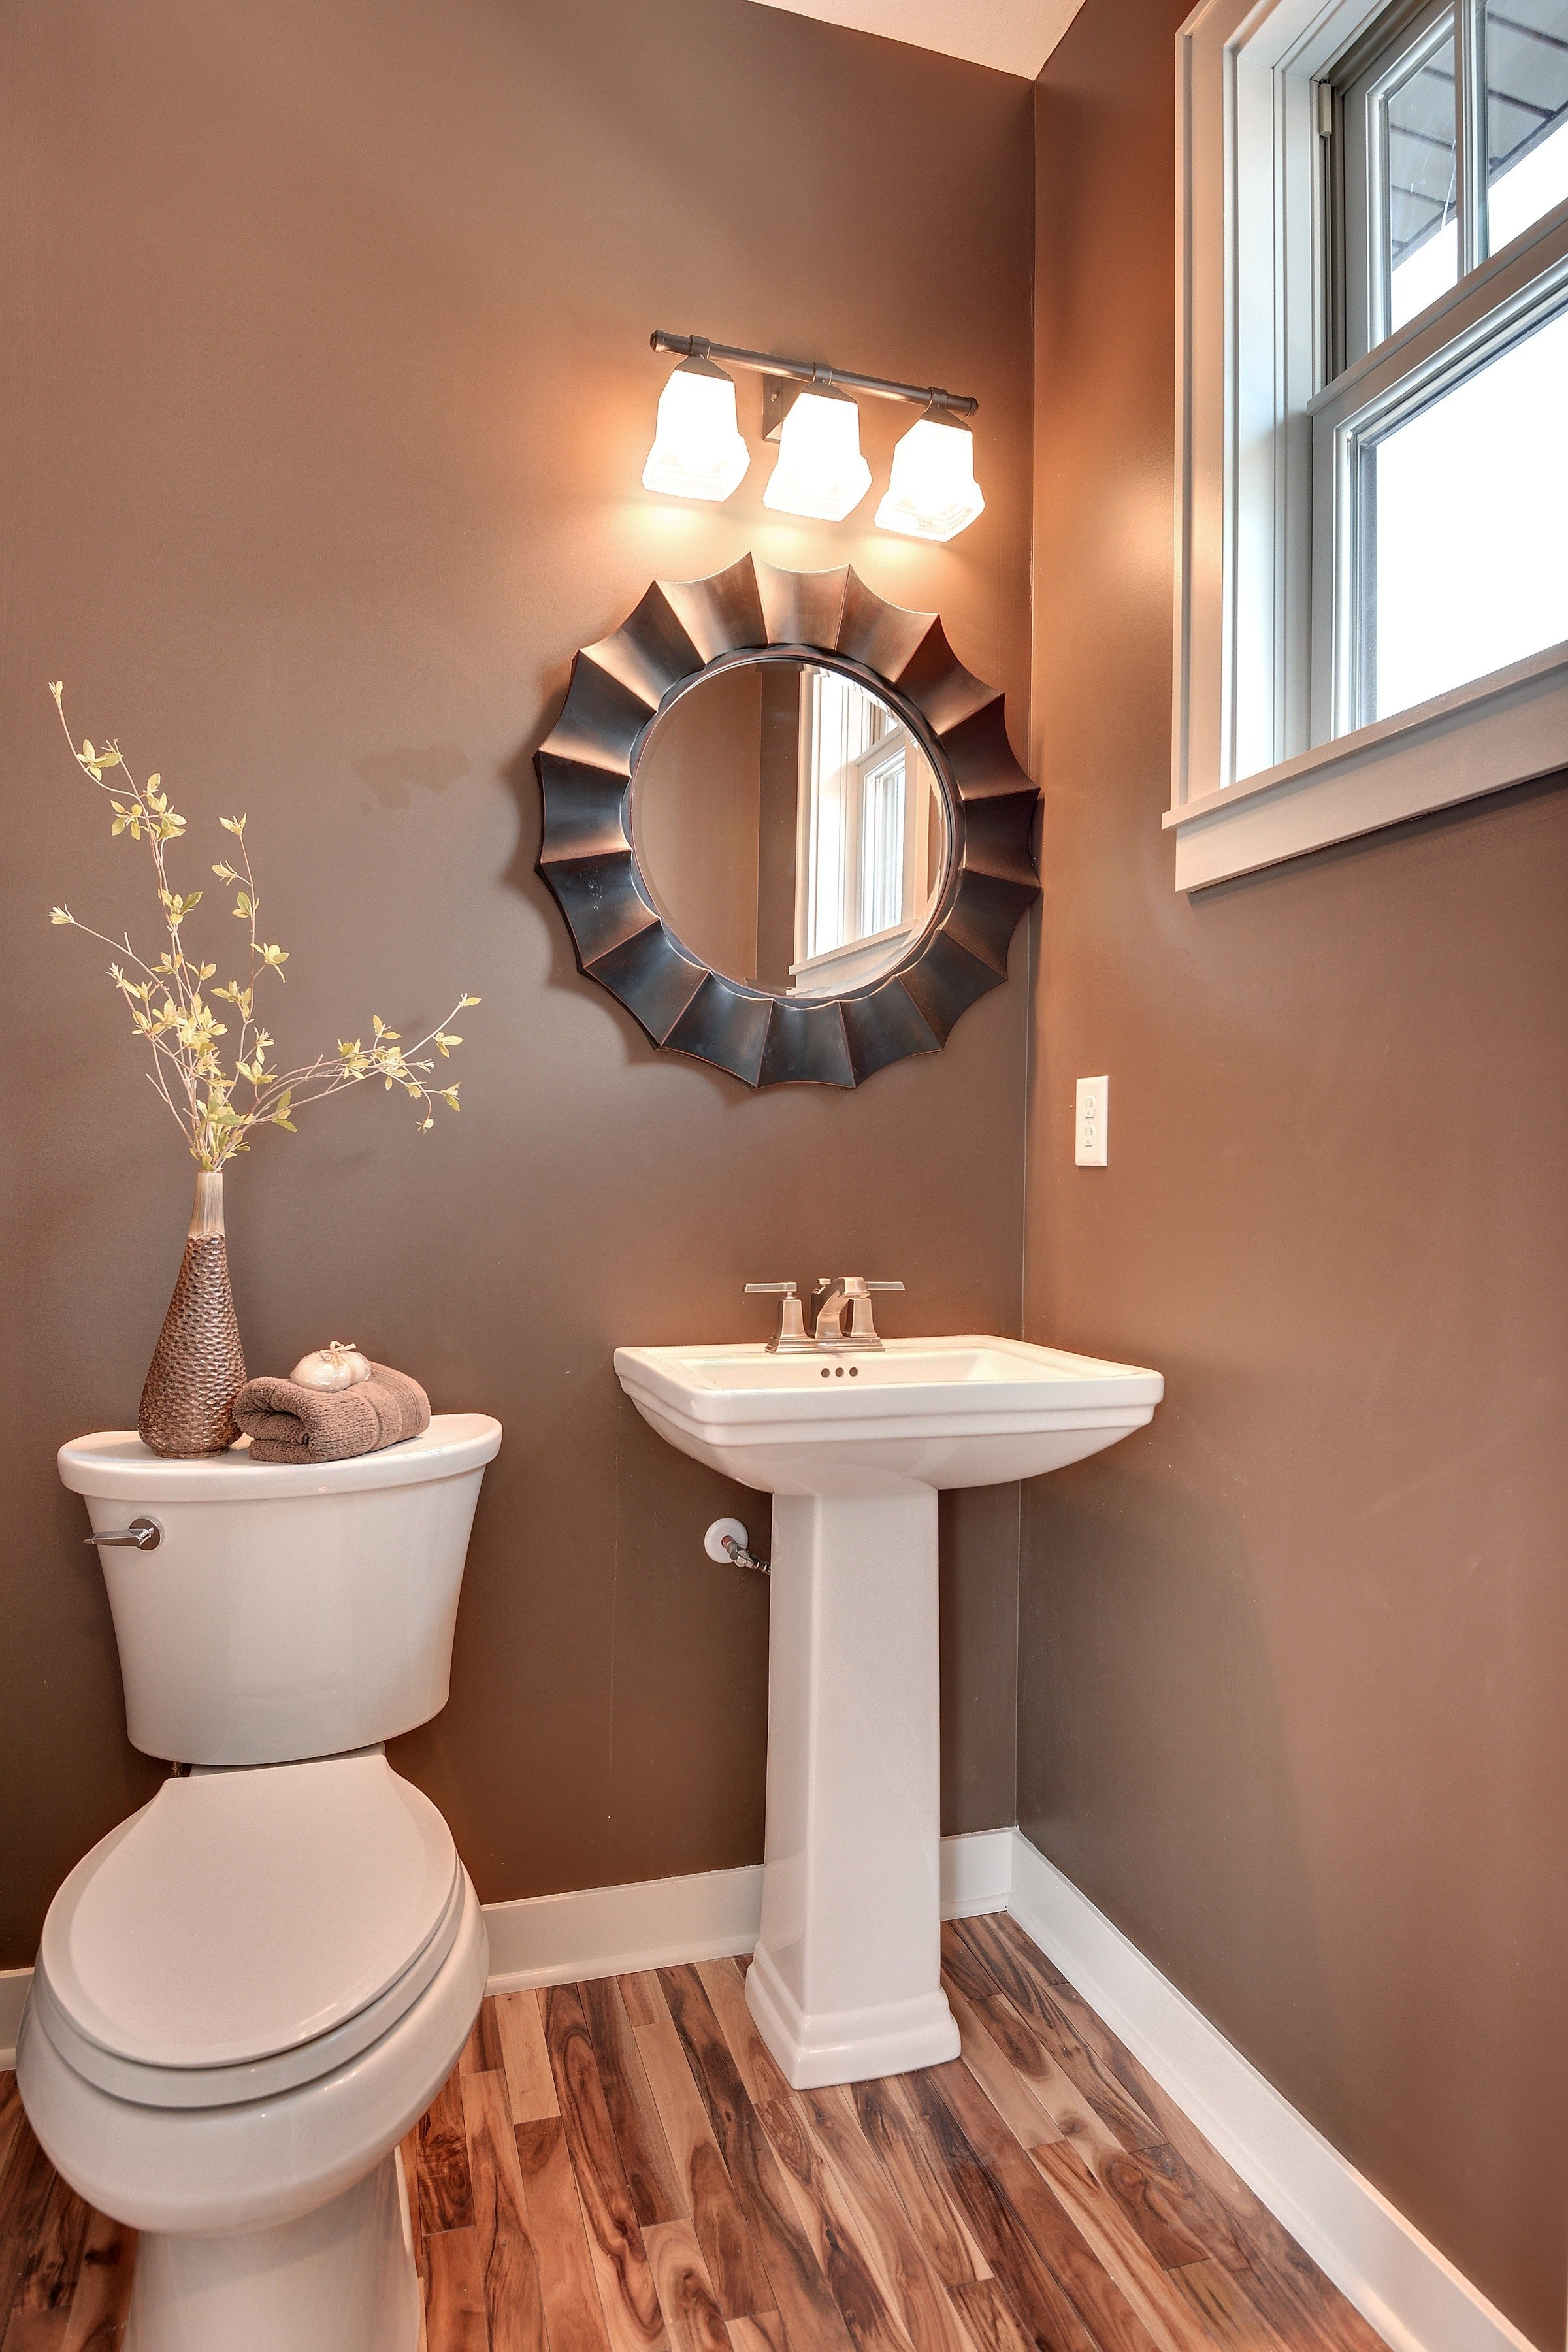 decorating ideas for small bathrooms in apartments | mediajoongdok